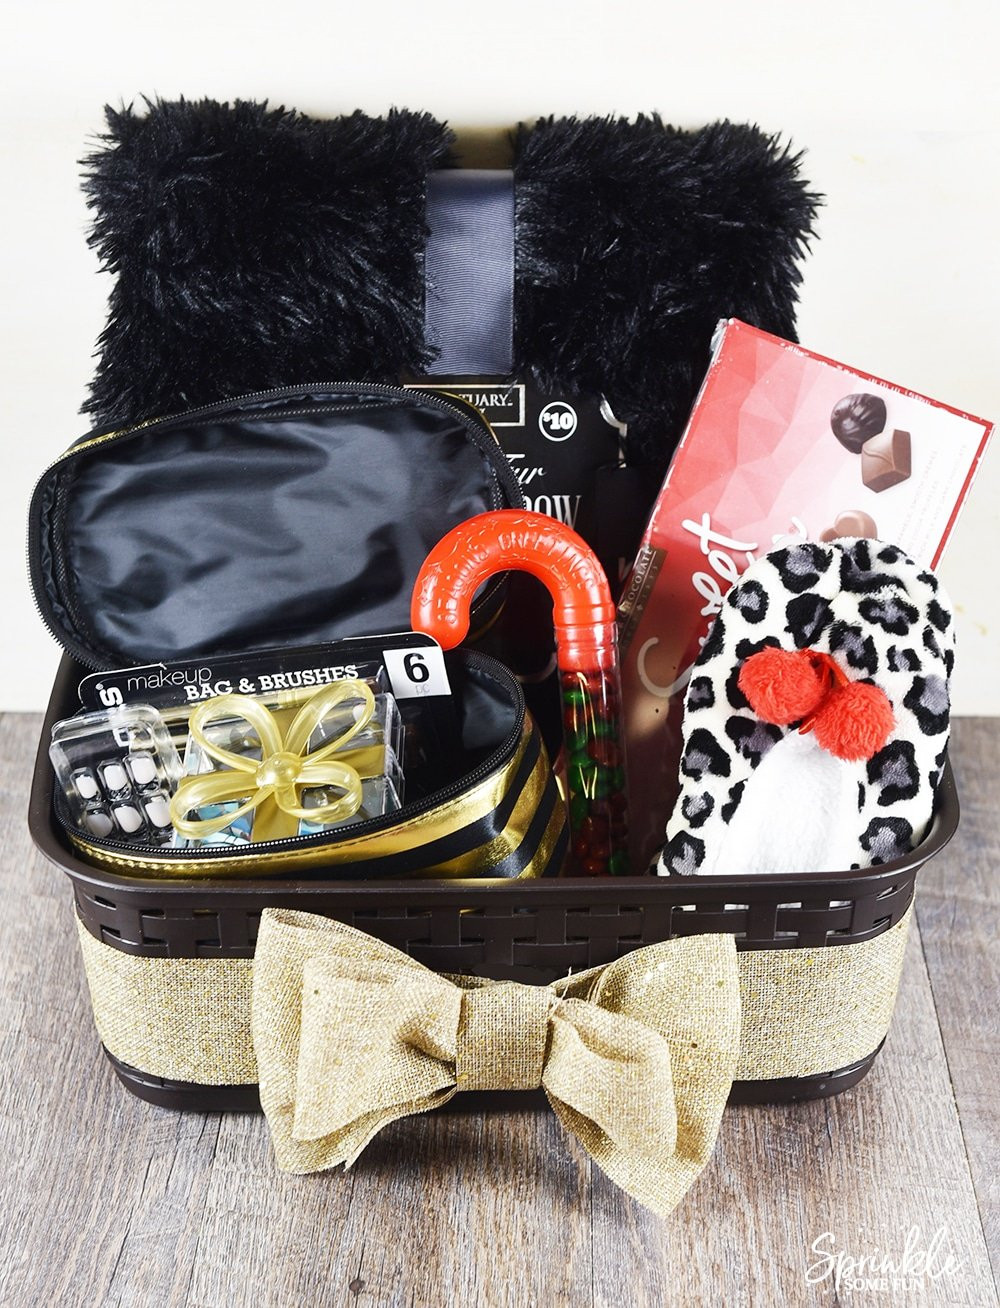 Gift Basket Ideas For Girls  DIY Holiday Gift Basket Idea for Teen Girls ⋆ Sprinkle